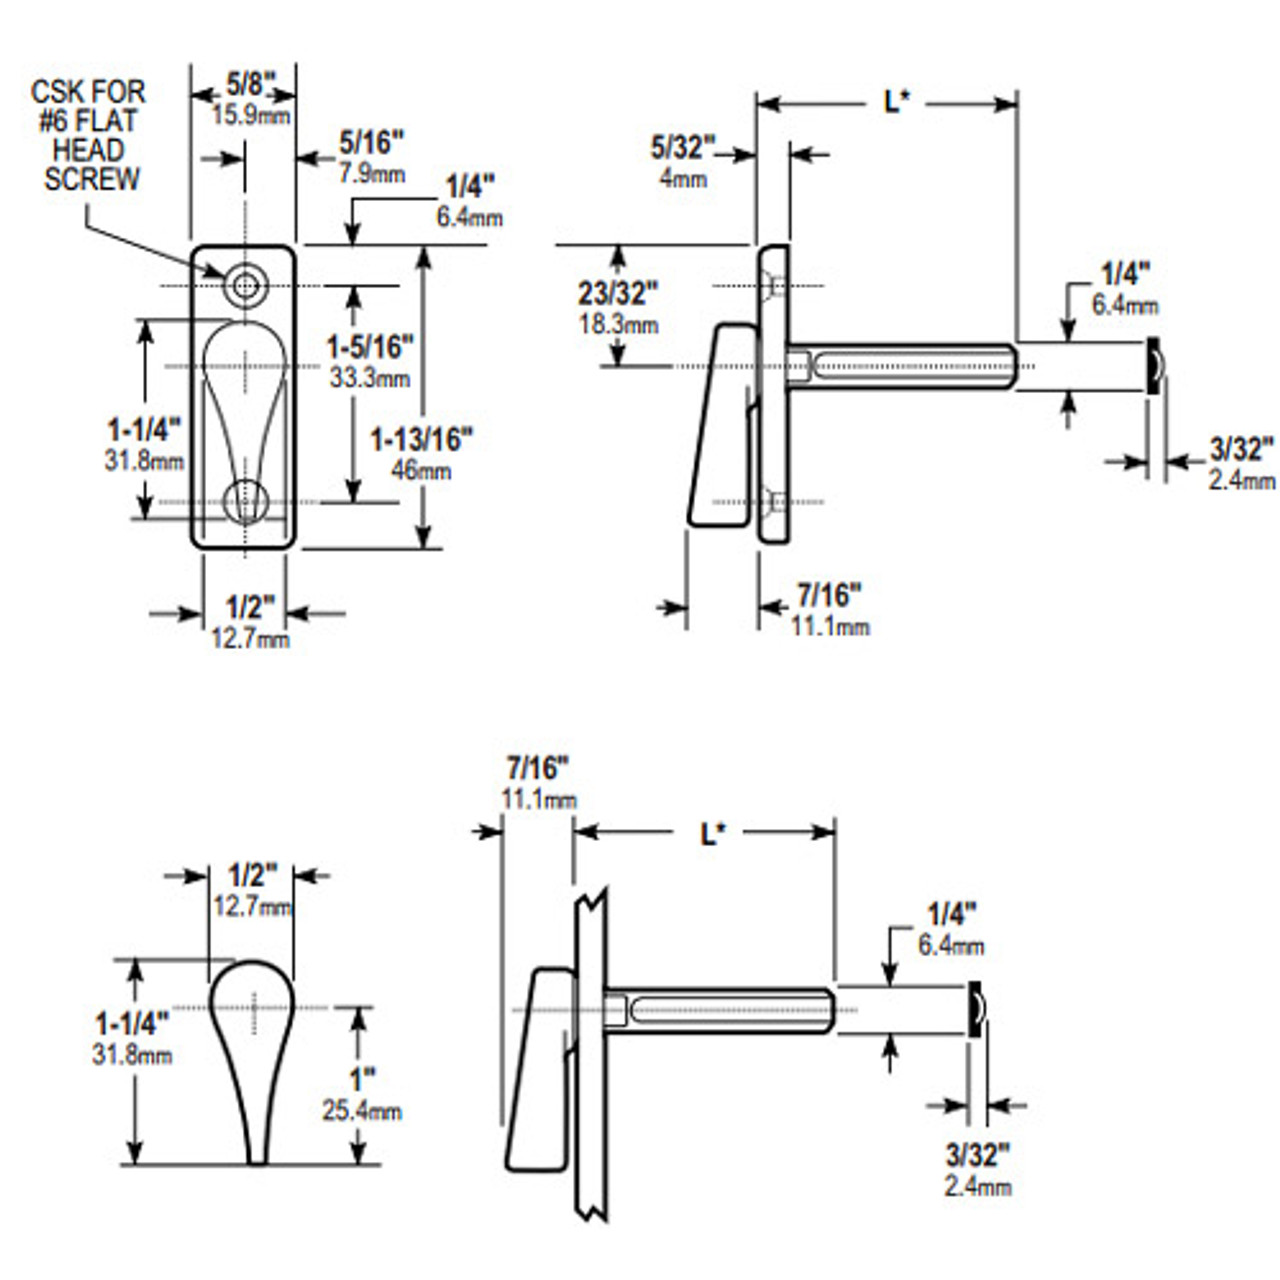 1000-11-19-121 Adams Rite 1000 Series Turns Dimensional View